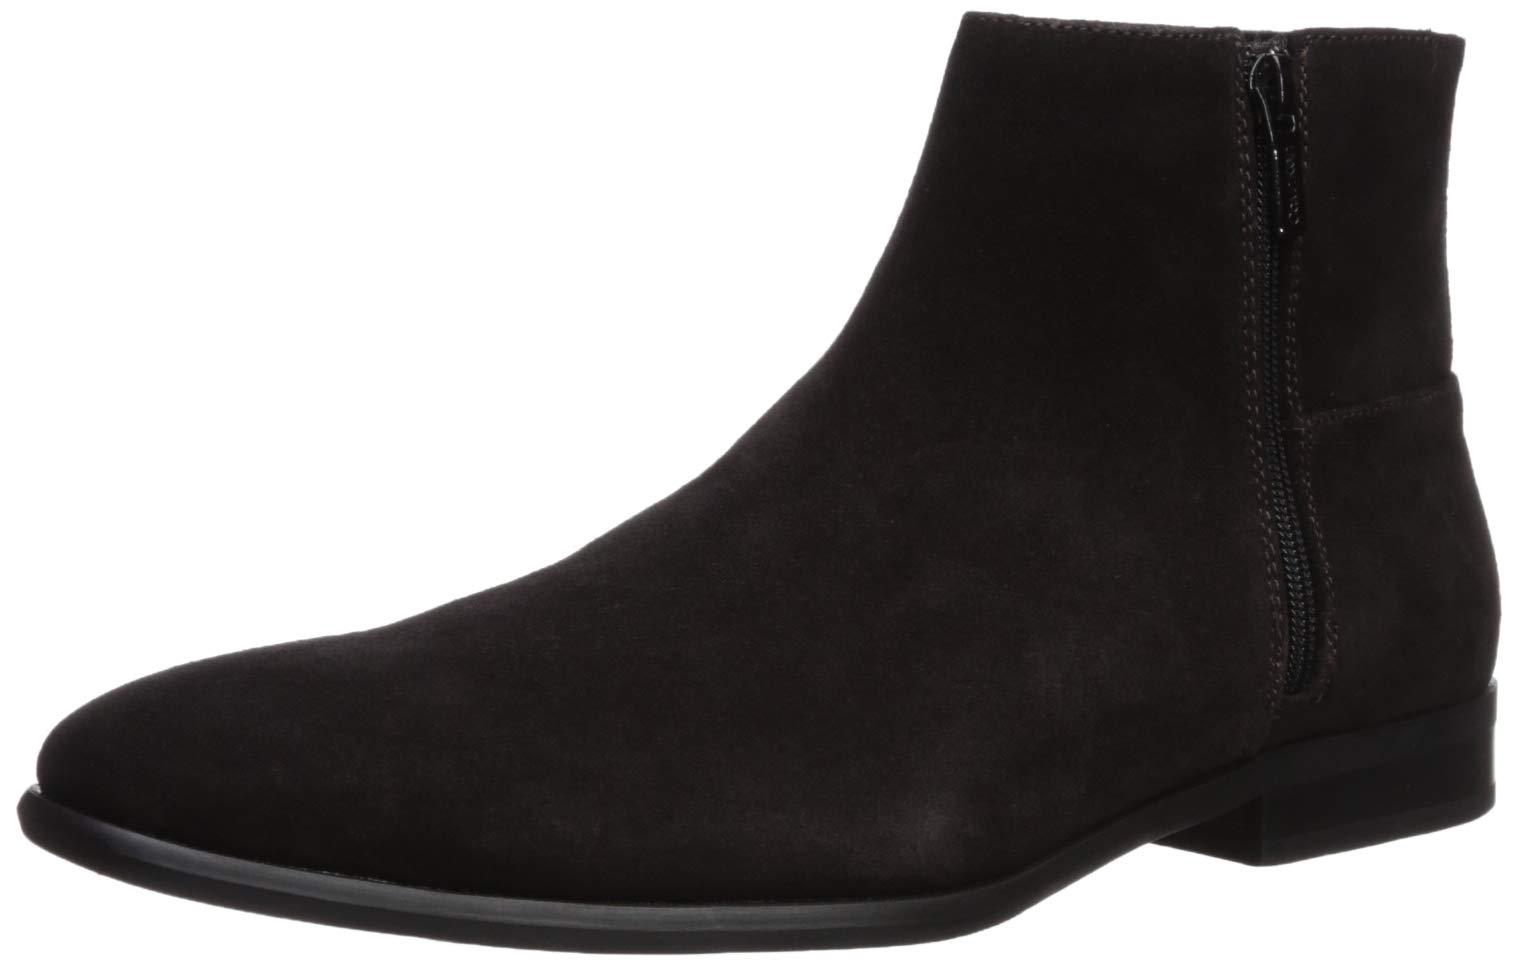 Calvin Klein Men's Luciano Ankle Boot Dark Brown Calf Suede 7 M US